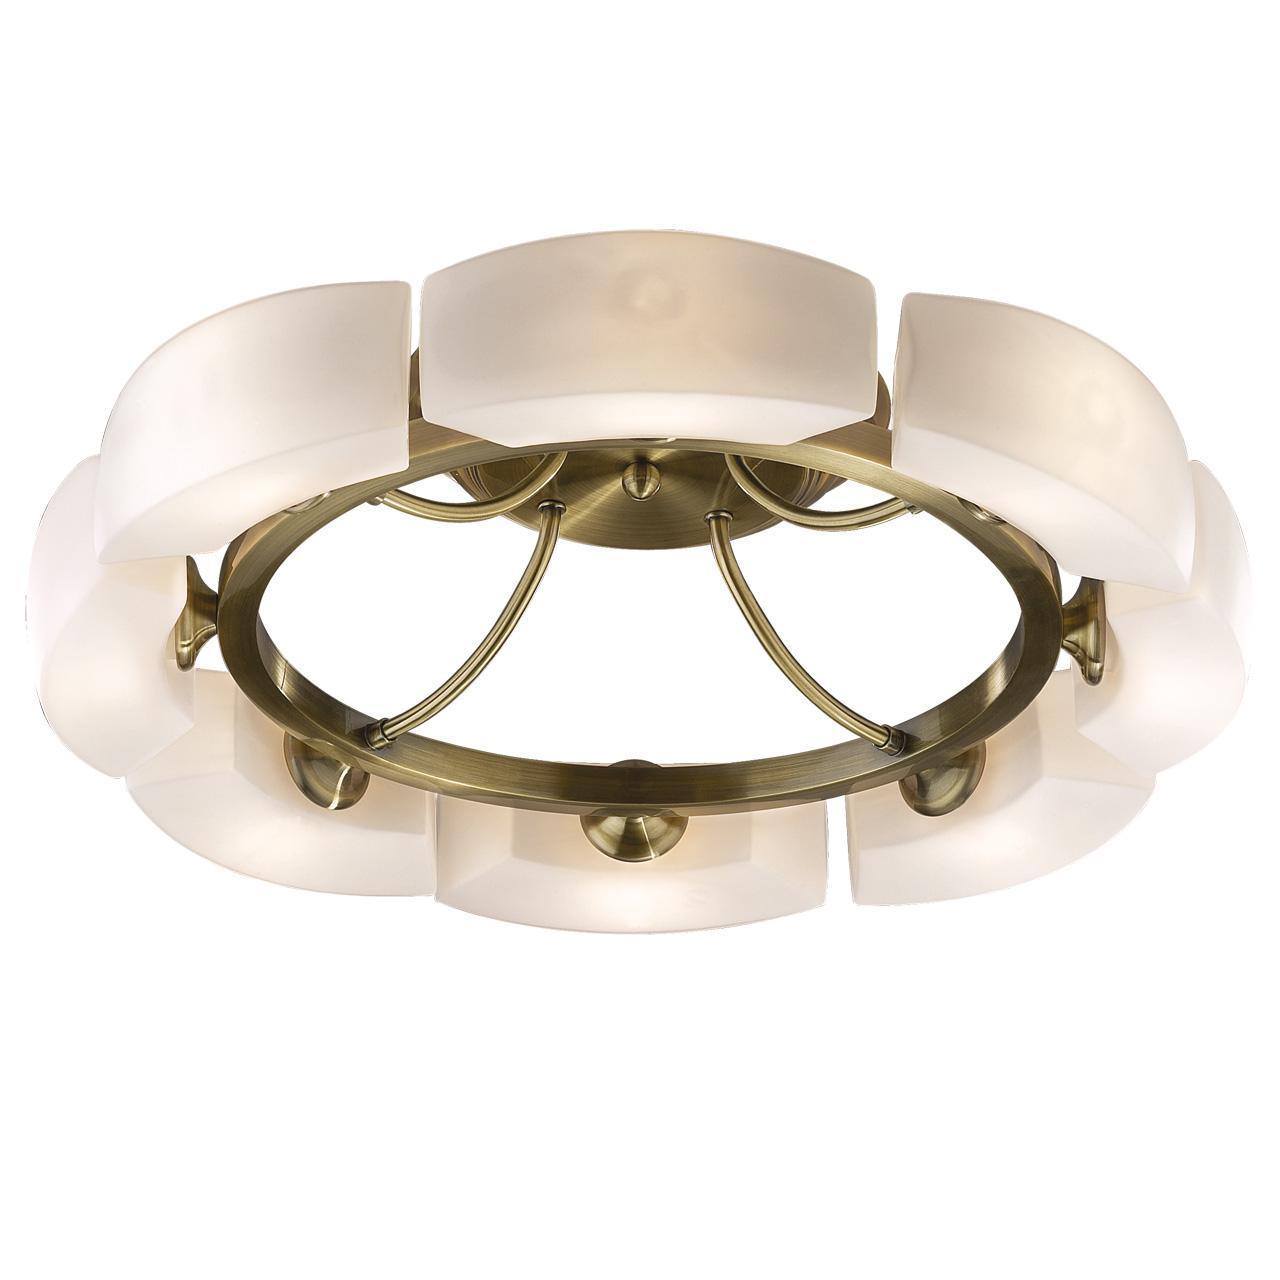 Люстра Odeon Light Barca 1713/8C потолочная odeon light потолочная люстра odeon light barca 1713 8c